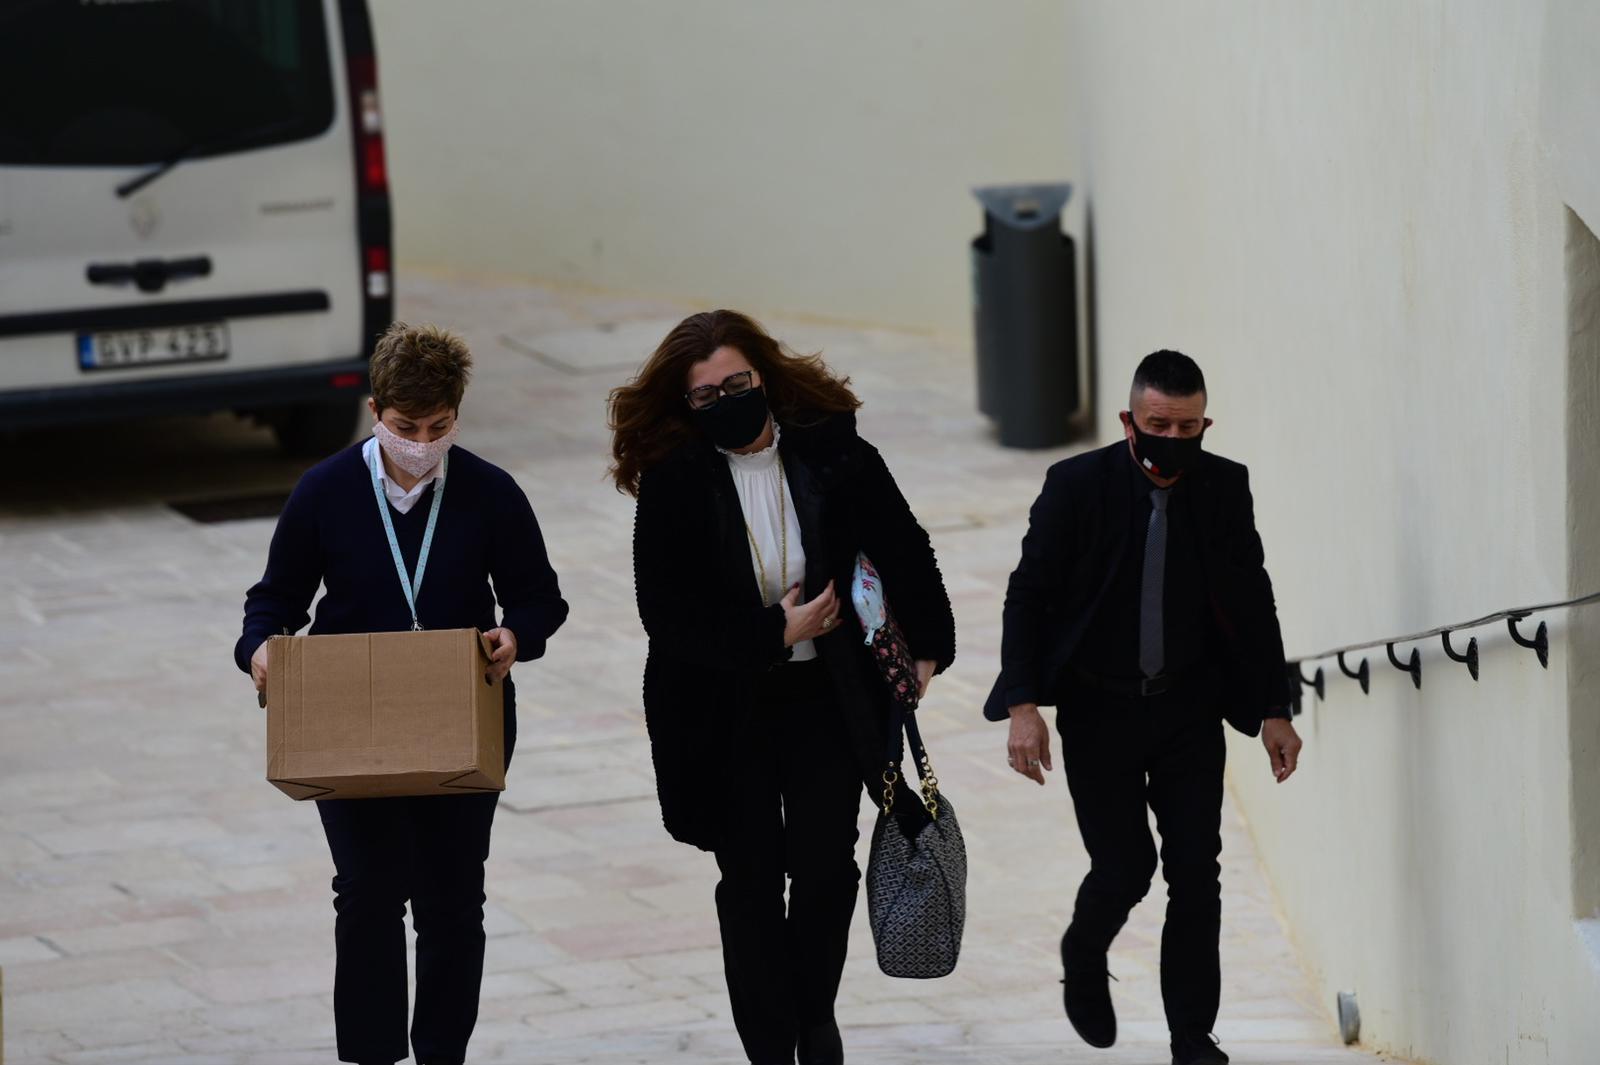 Magistrate Monica Vella (centre) enters the Gozo law courts on Wednesday. Photo: Mark Zammit Cordina